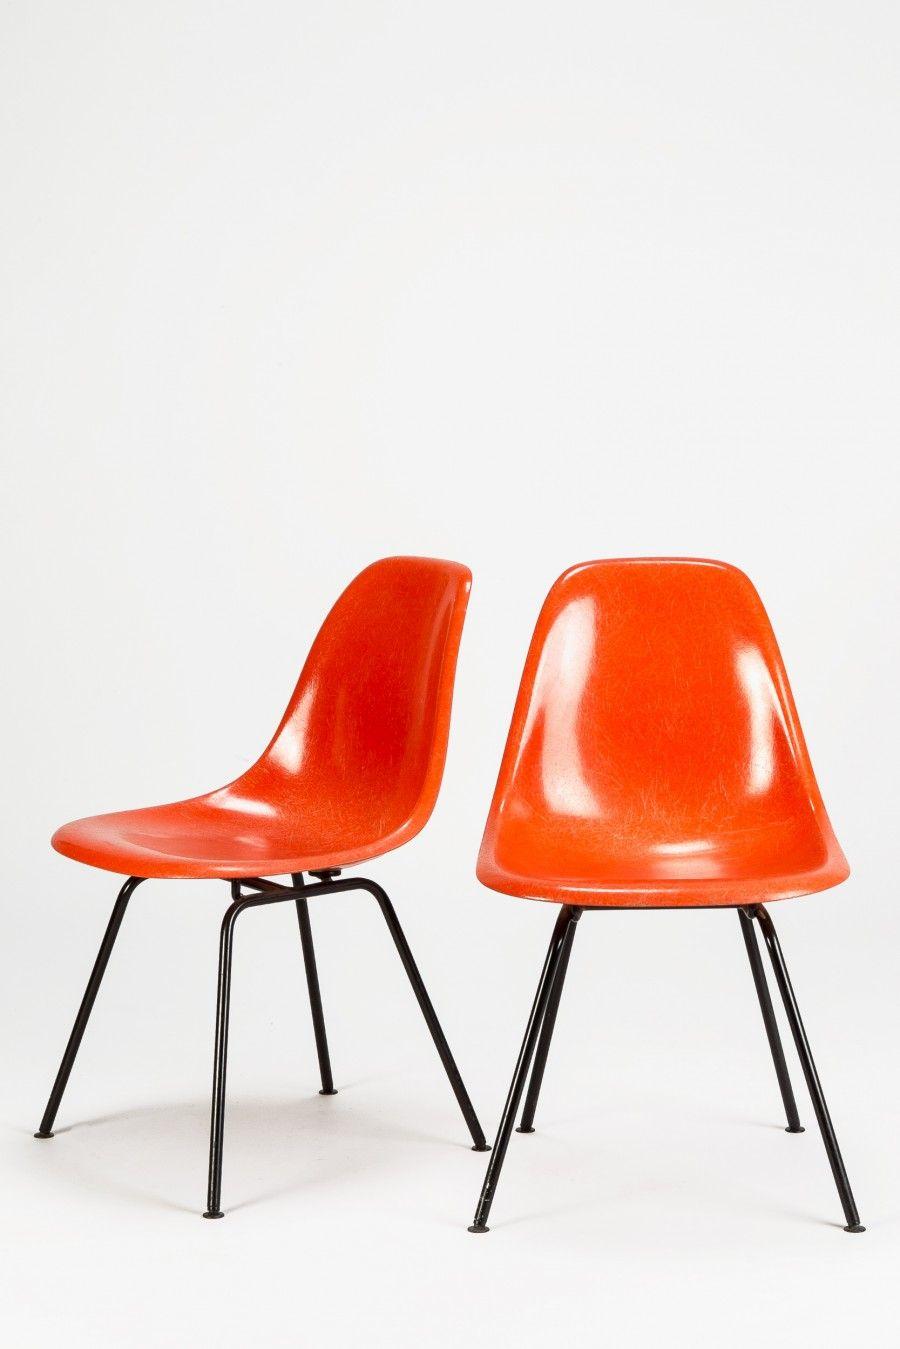 Set Of 8 Eames H Base Chairs Eames Orange Eameschairs Eames Design Mobilier Mobilier De Salon Et Chaise